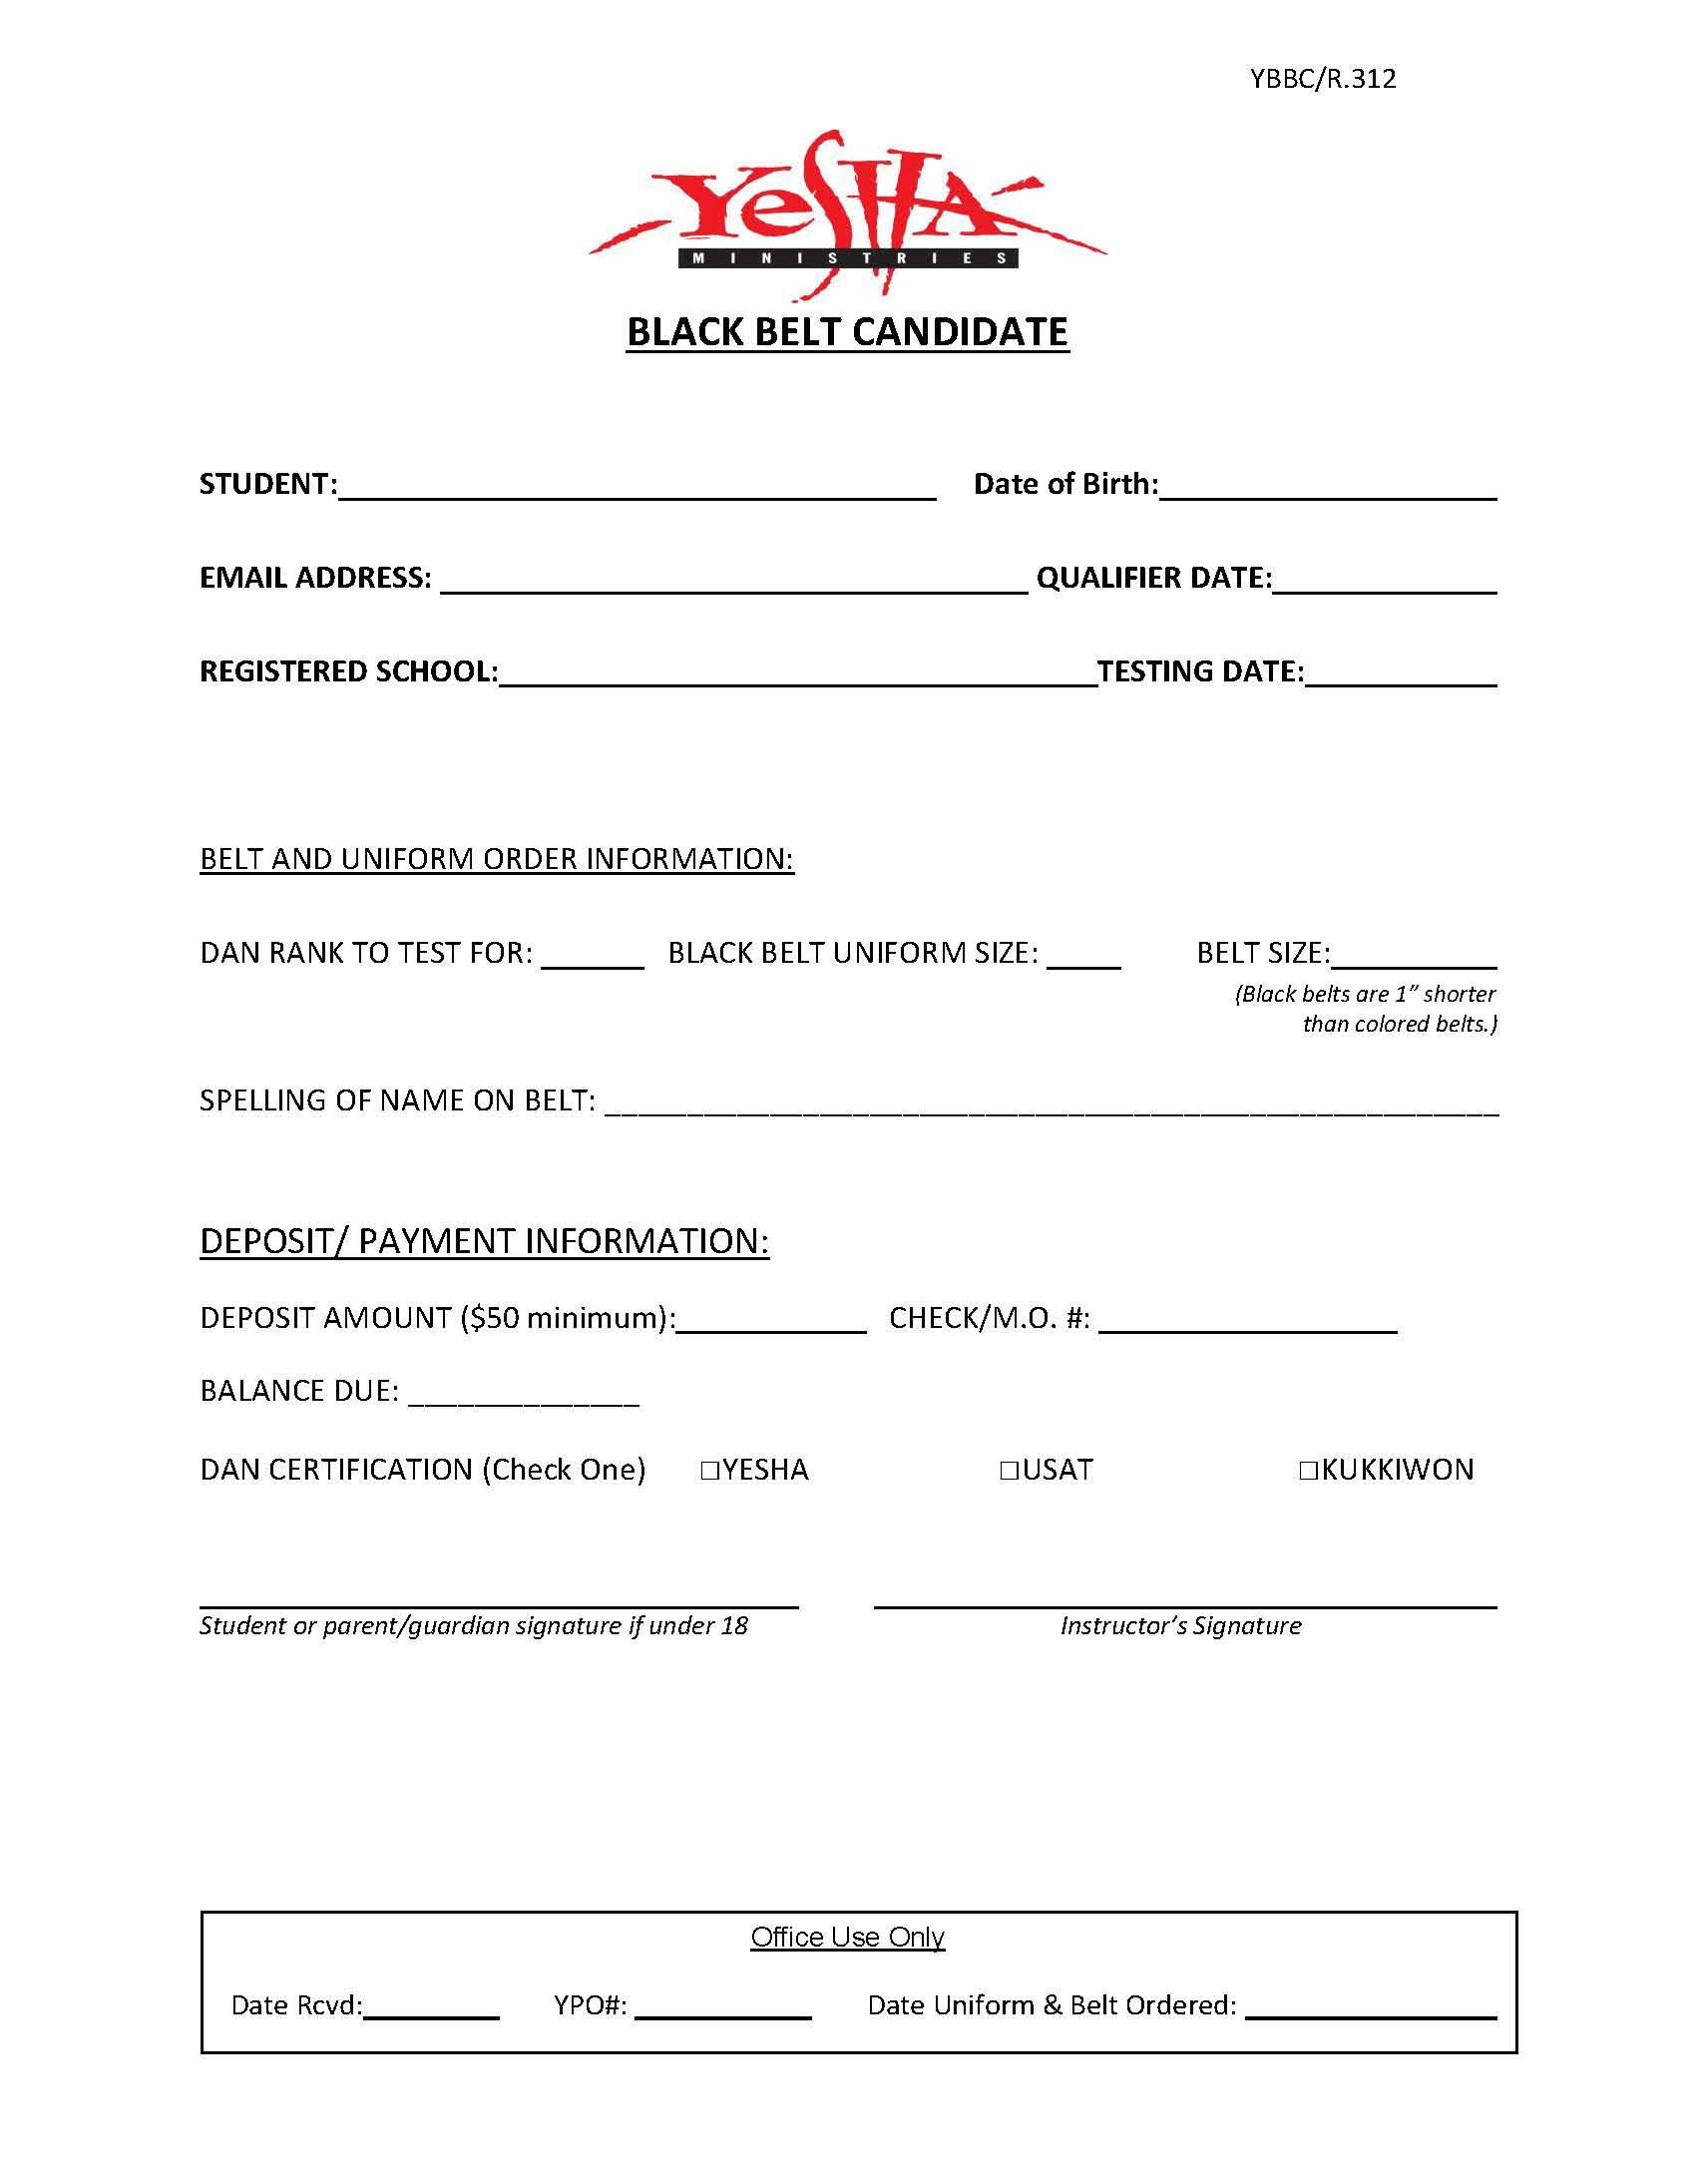 BB Candidate Form bbd revSept2014.jpg